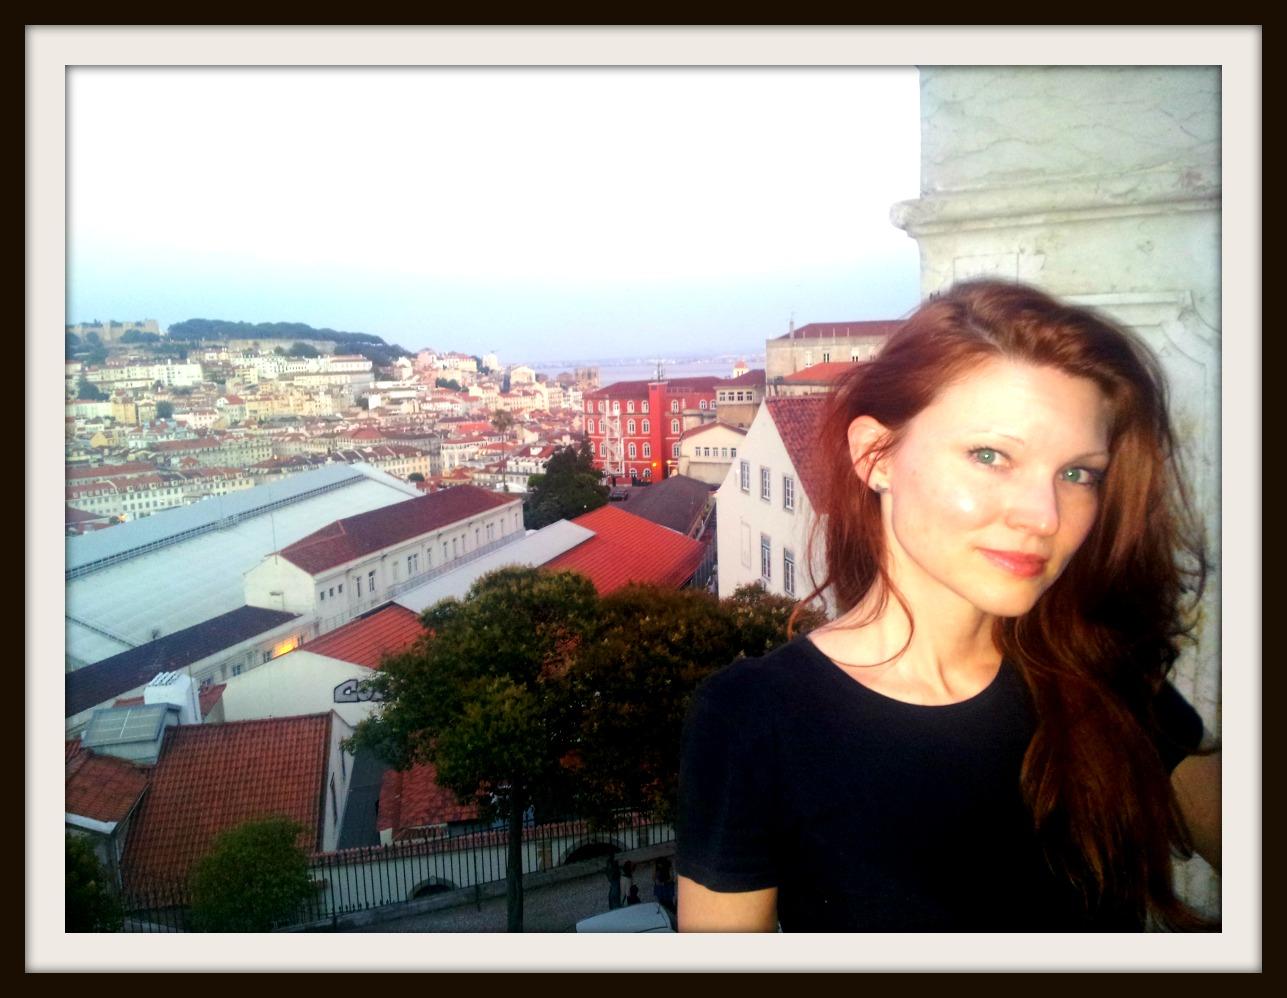 Portugal at dusk